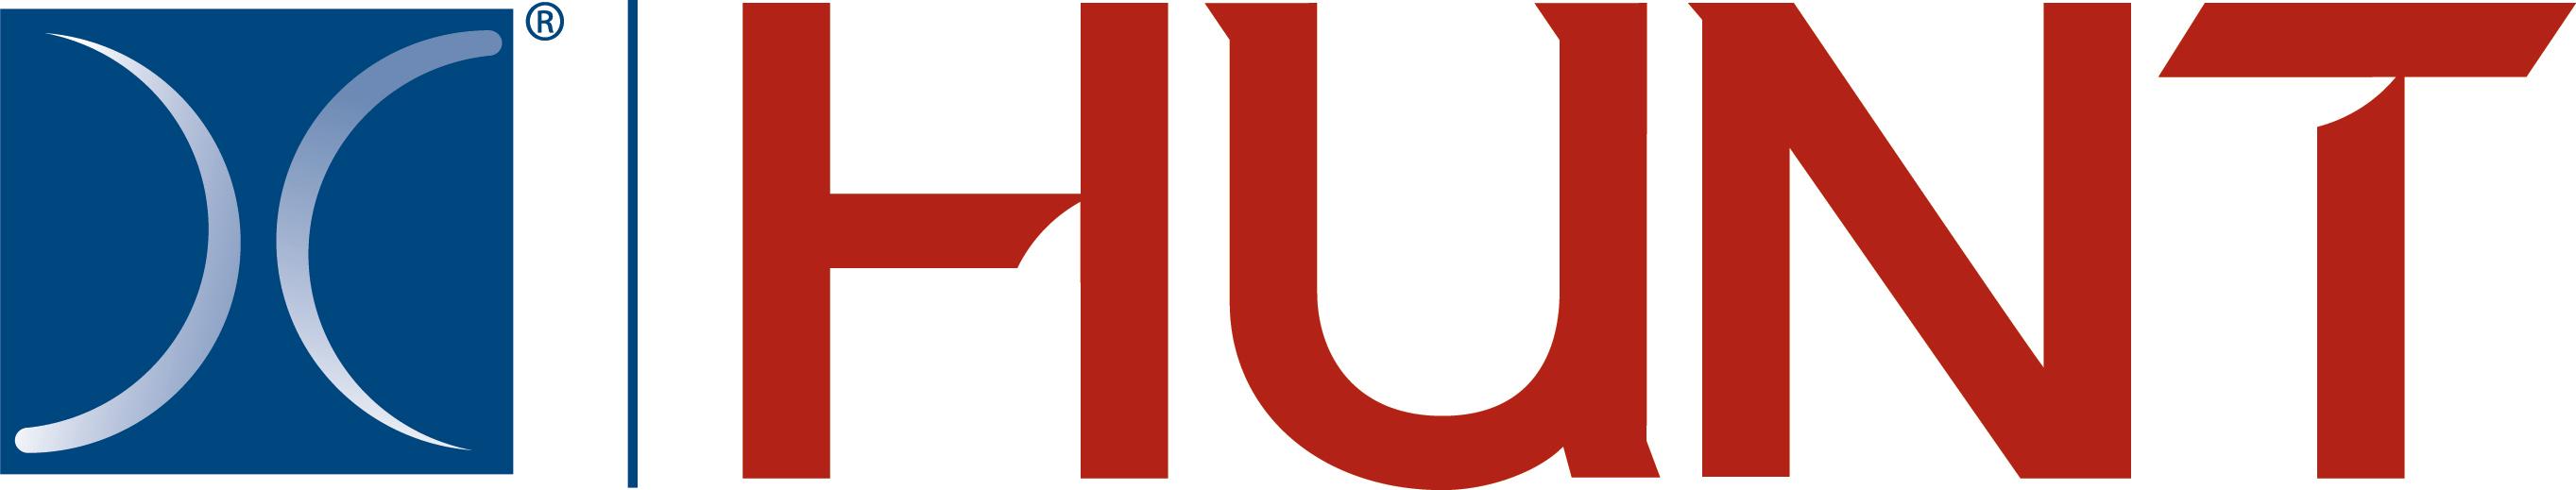 Hunt Companies, Inc's logo